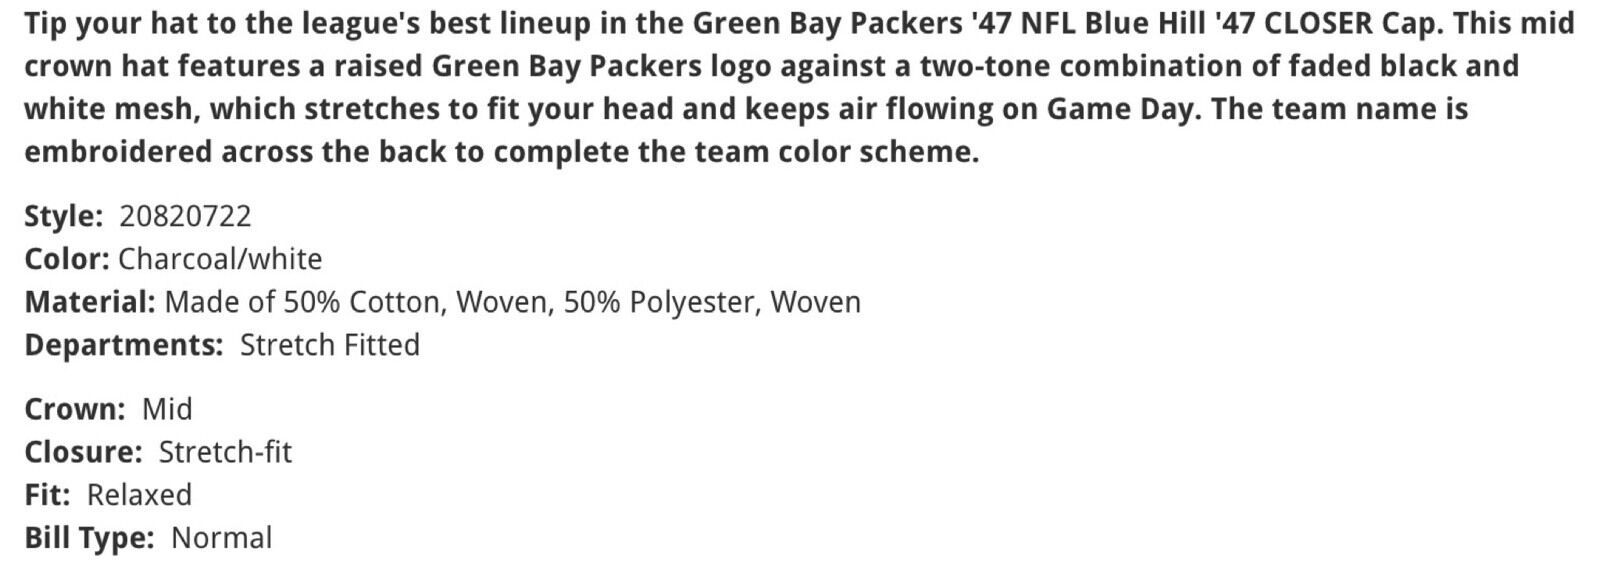 Green Bay Packers '47 Brand Blue Hill Closer FlexFit L/XL Fitted Mesh Cap Hat